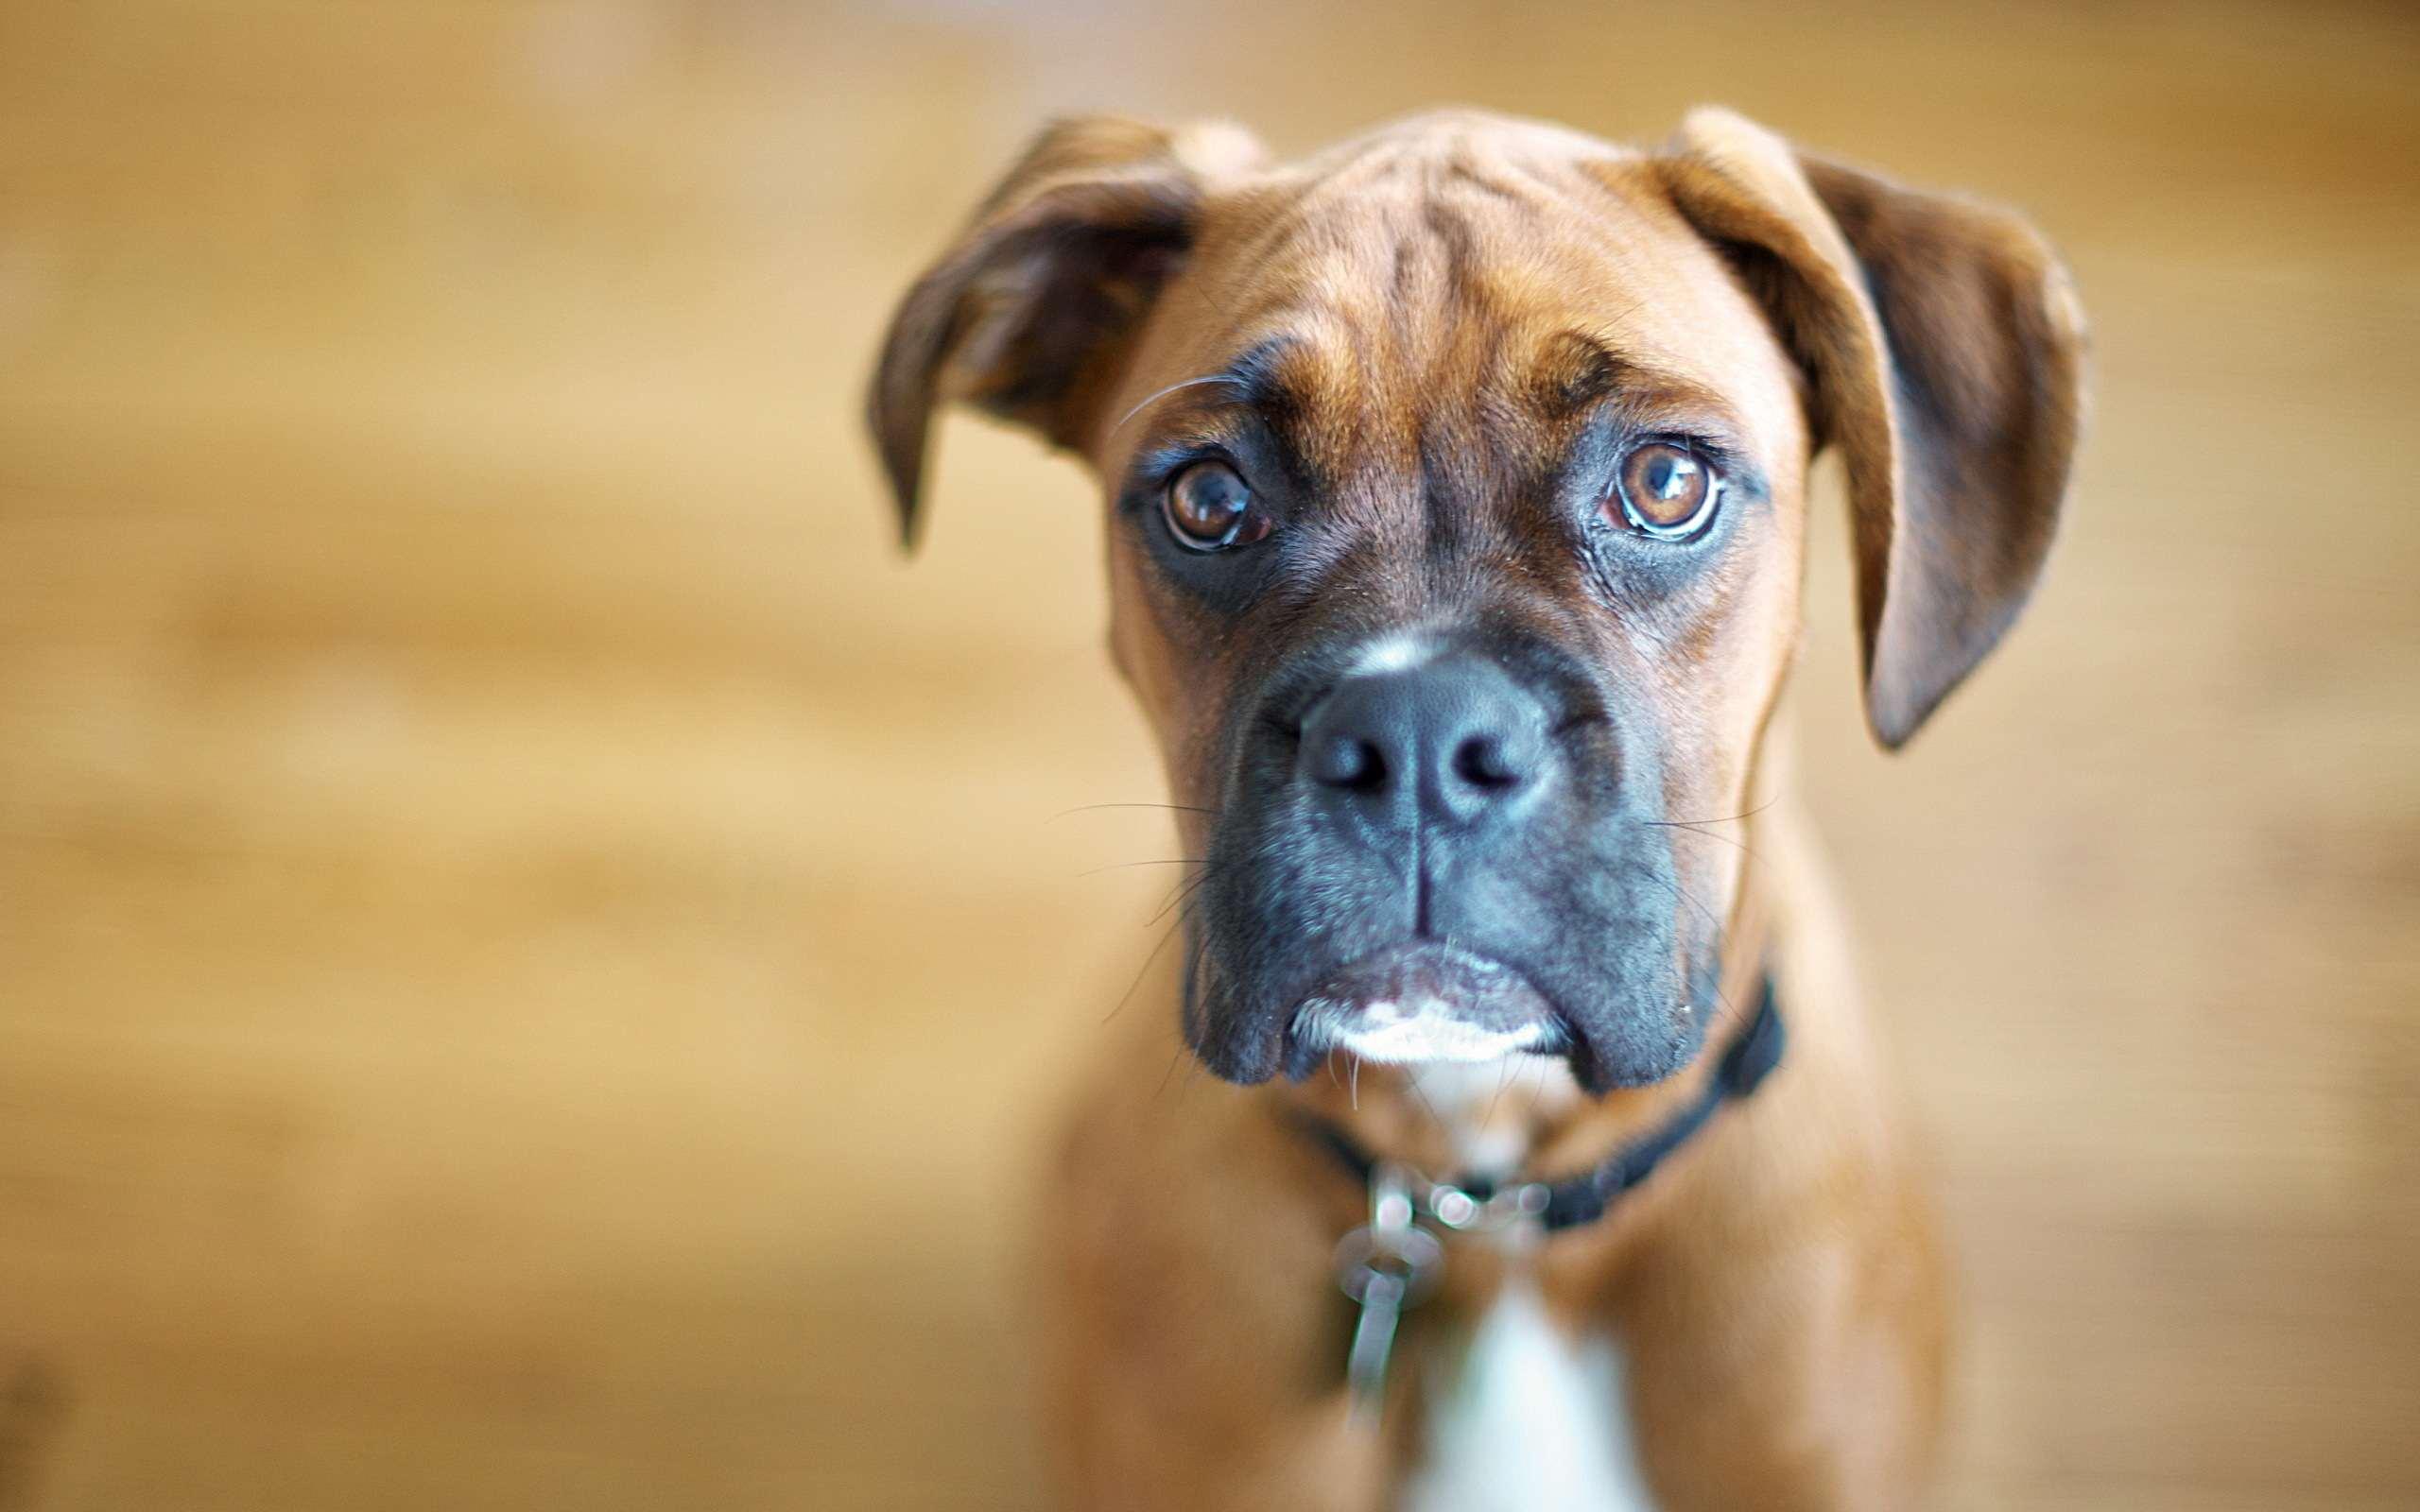 собака пёс взгляд морда dog view muzzle скачать